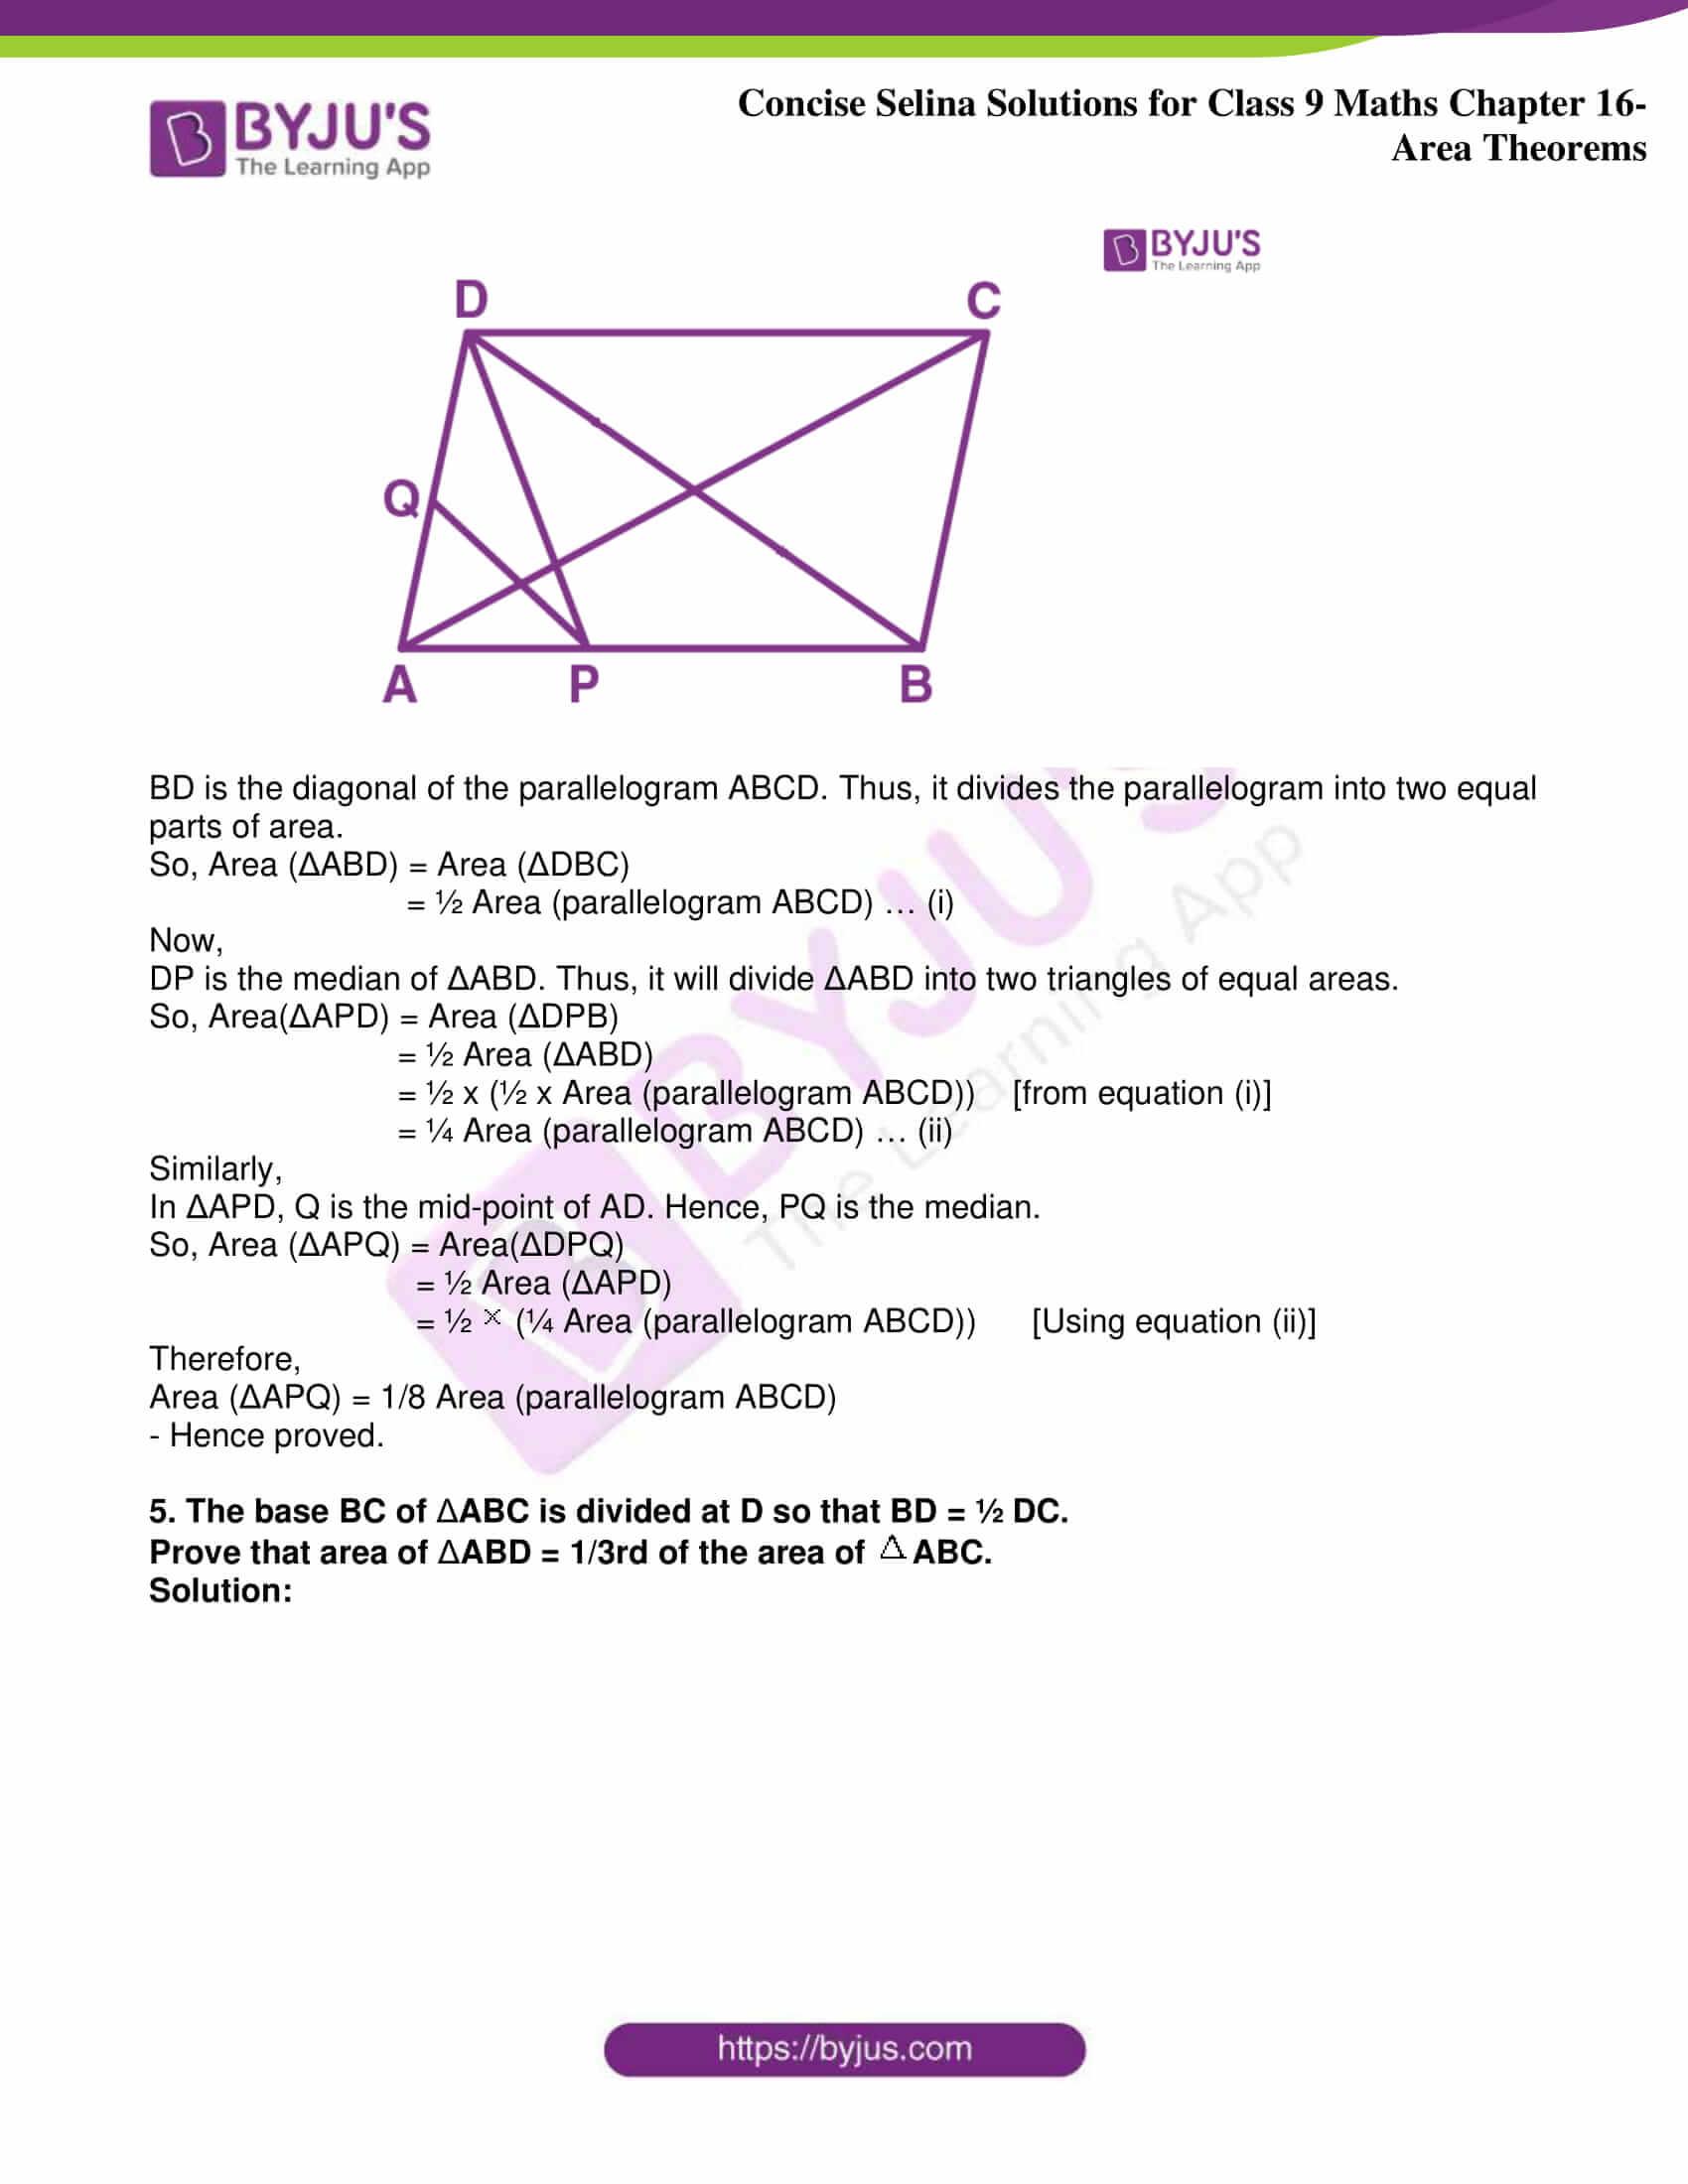 icse class 9 jun9 maths selina solutions chapter 16 area theorems 20